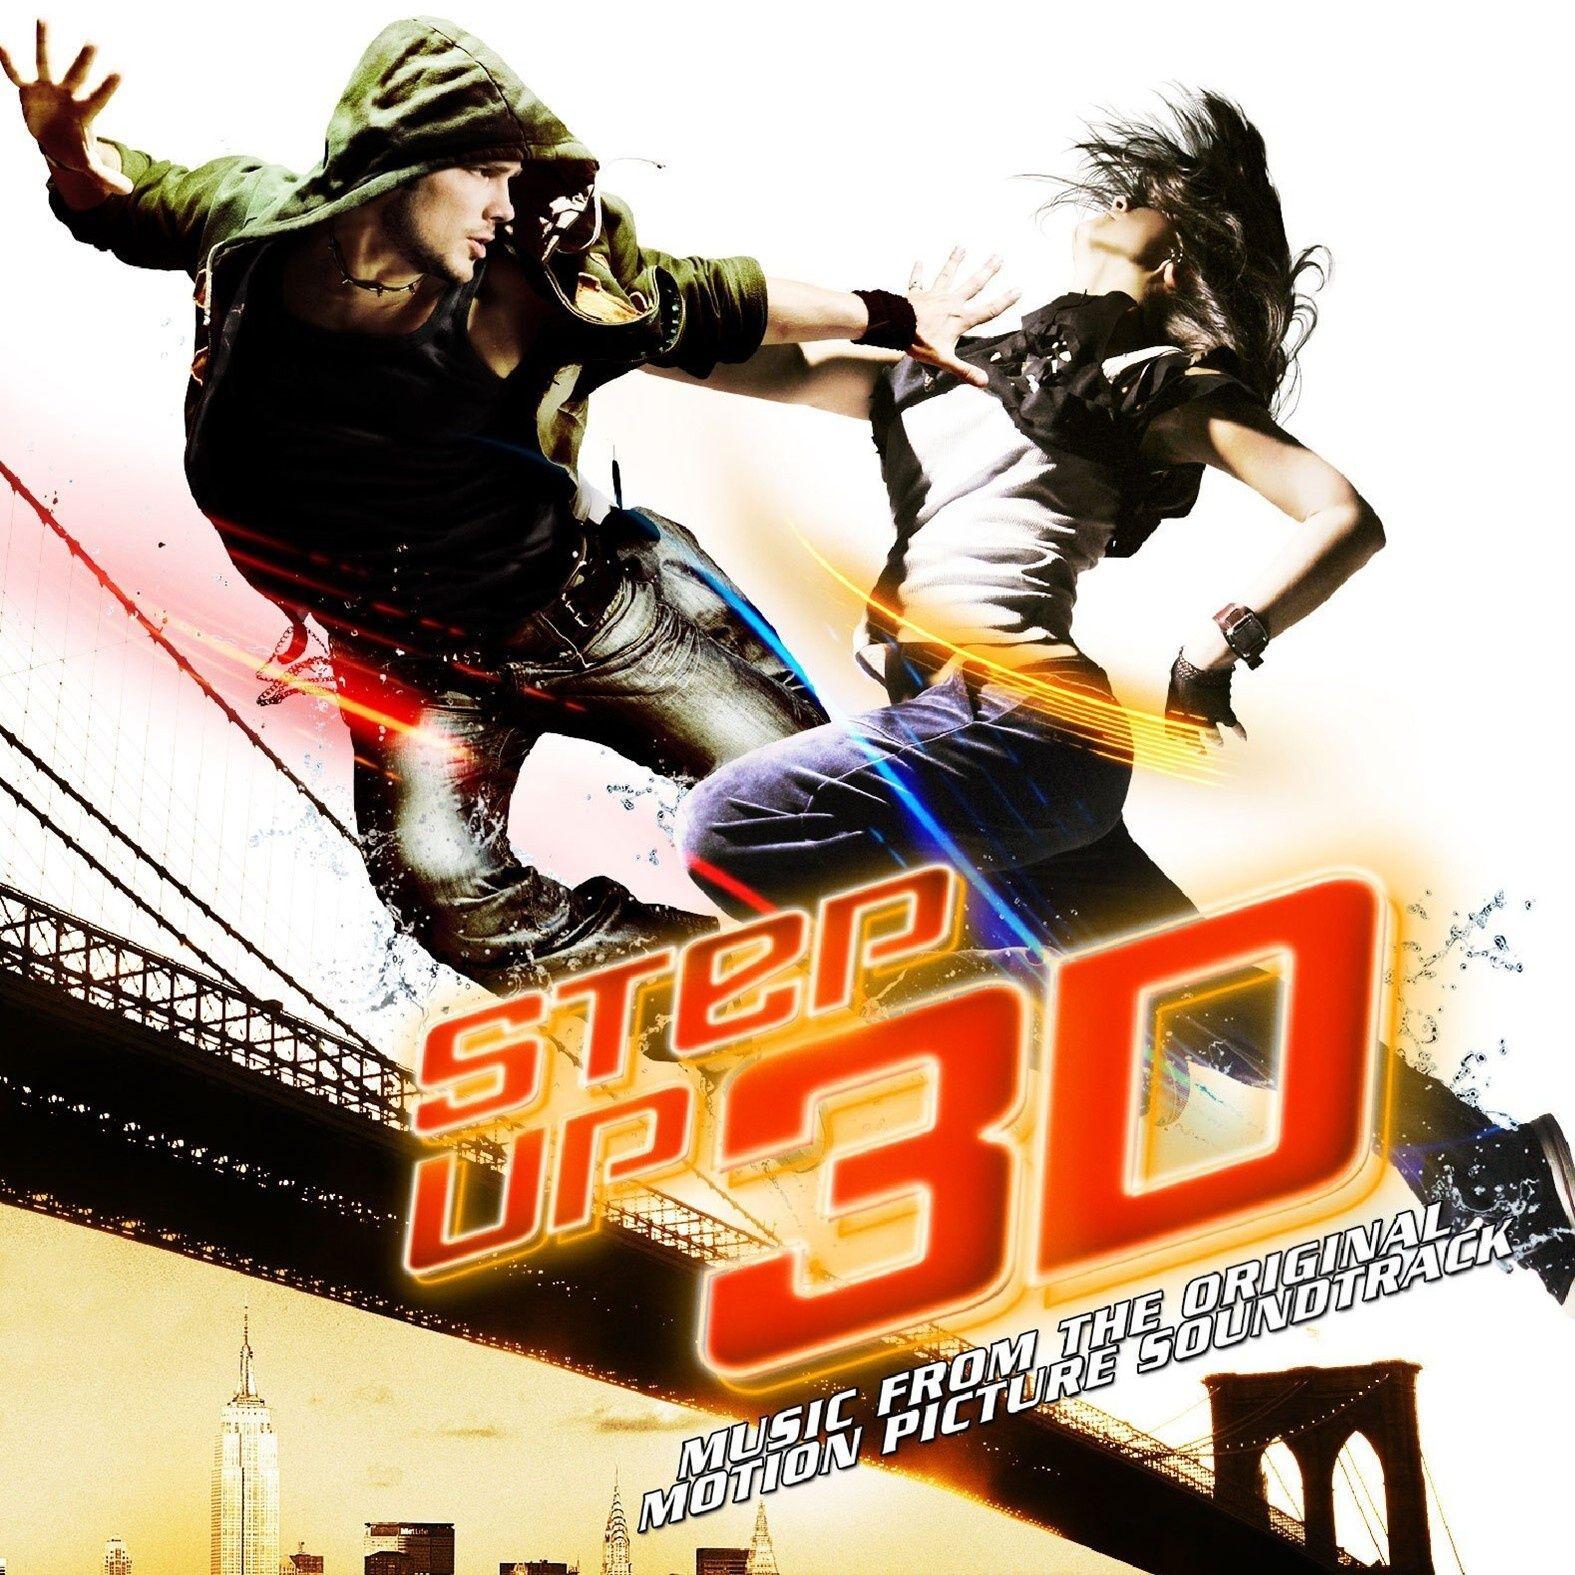 Soundtrack - Step Up 3D album cover